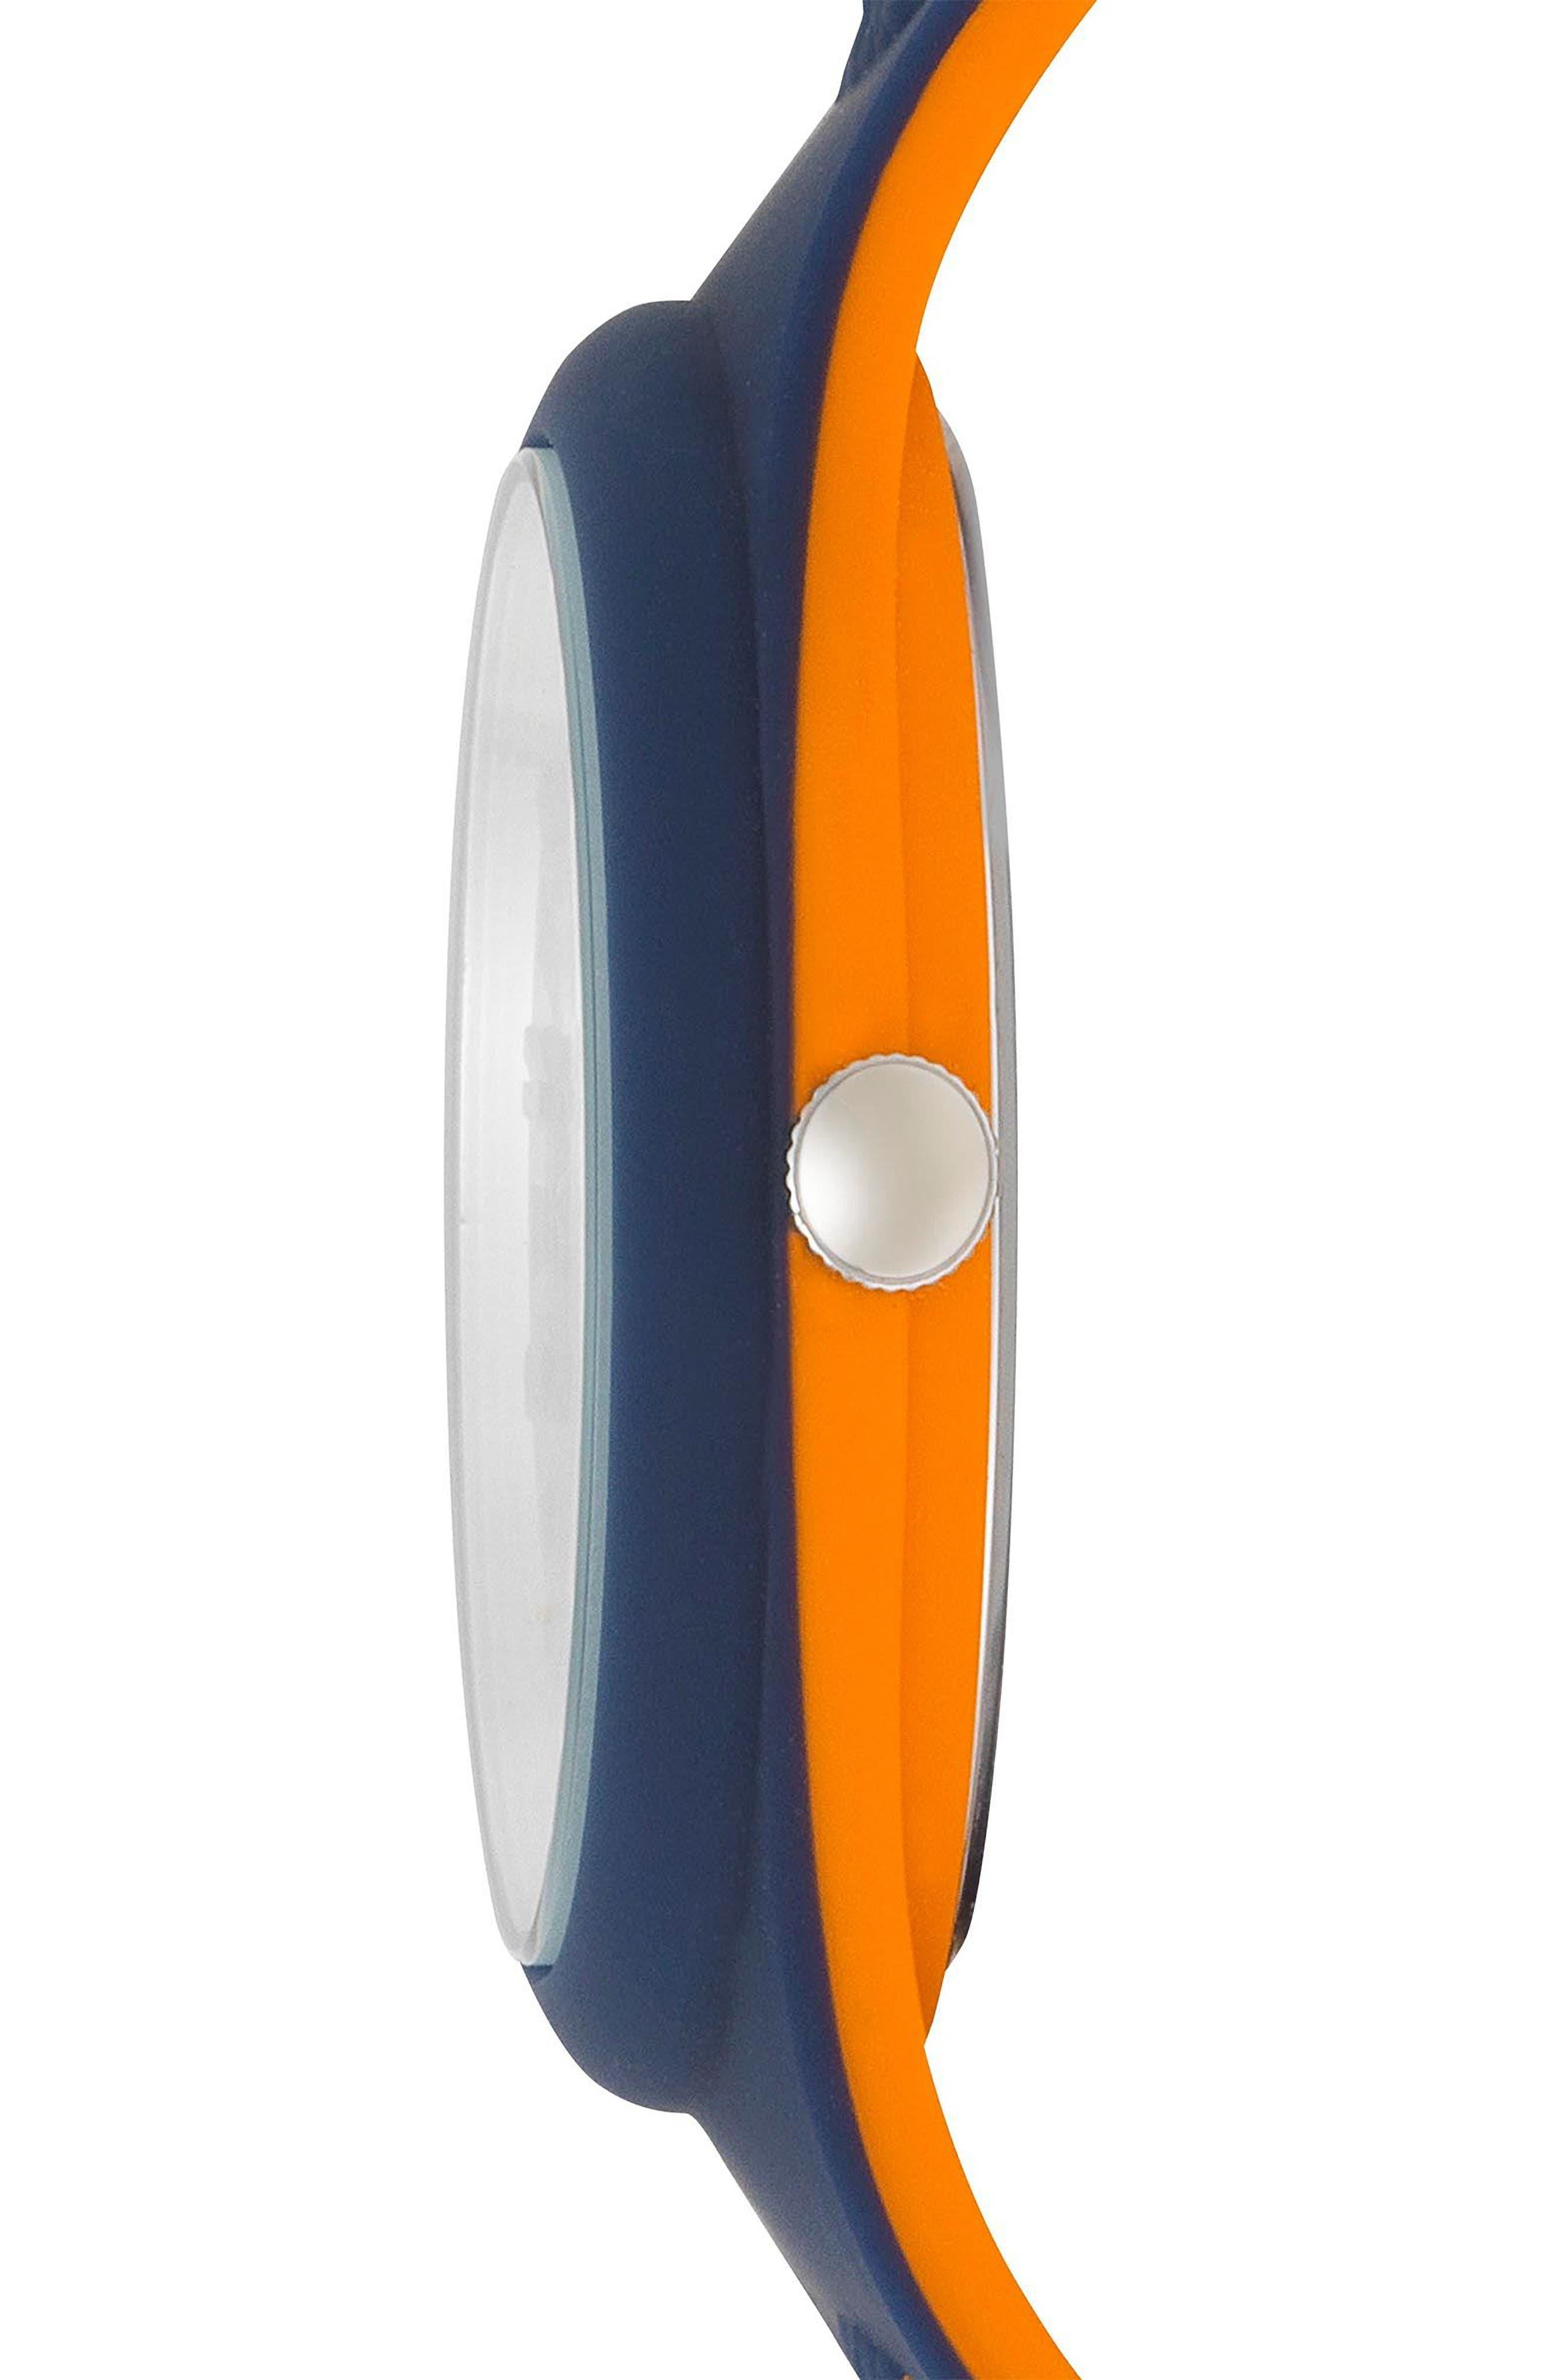 VERSUS VERSACE, Fire Island Silicone Strap Watch, 39mm, Alternate thumbnail 2, color, GREY/ ORANGE